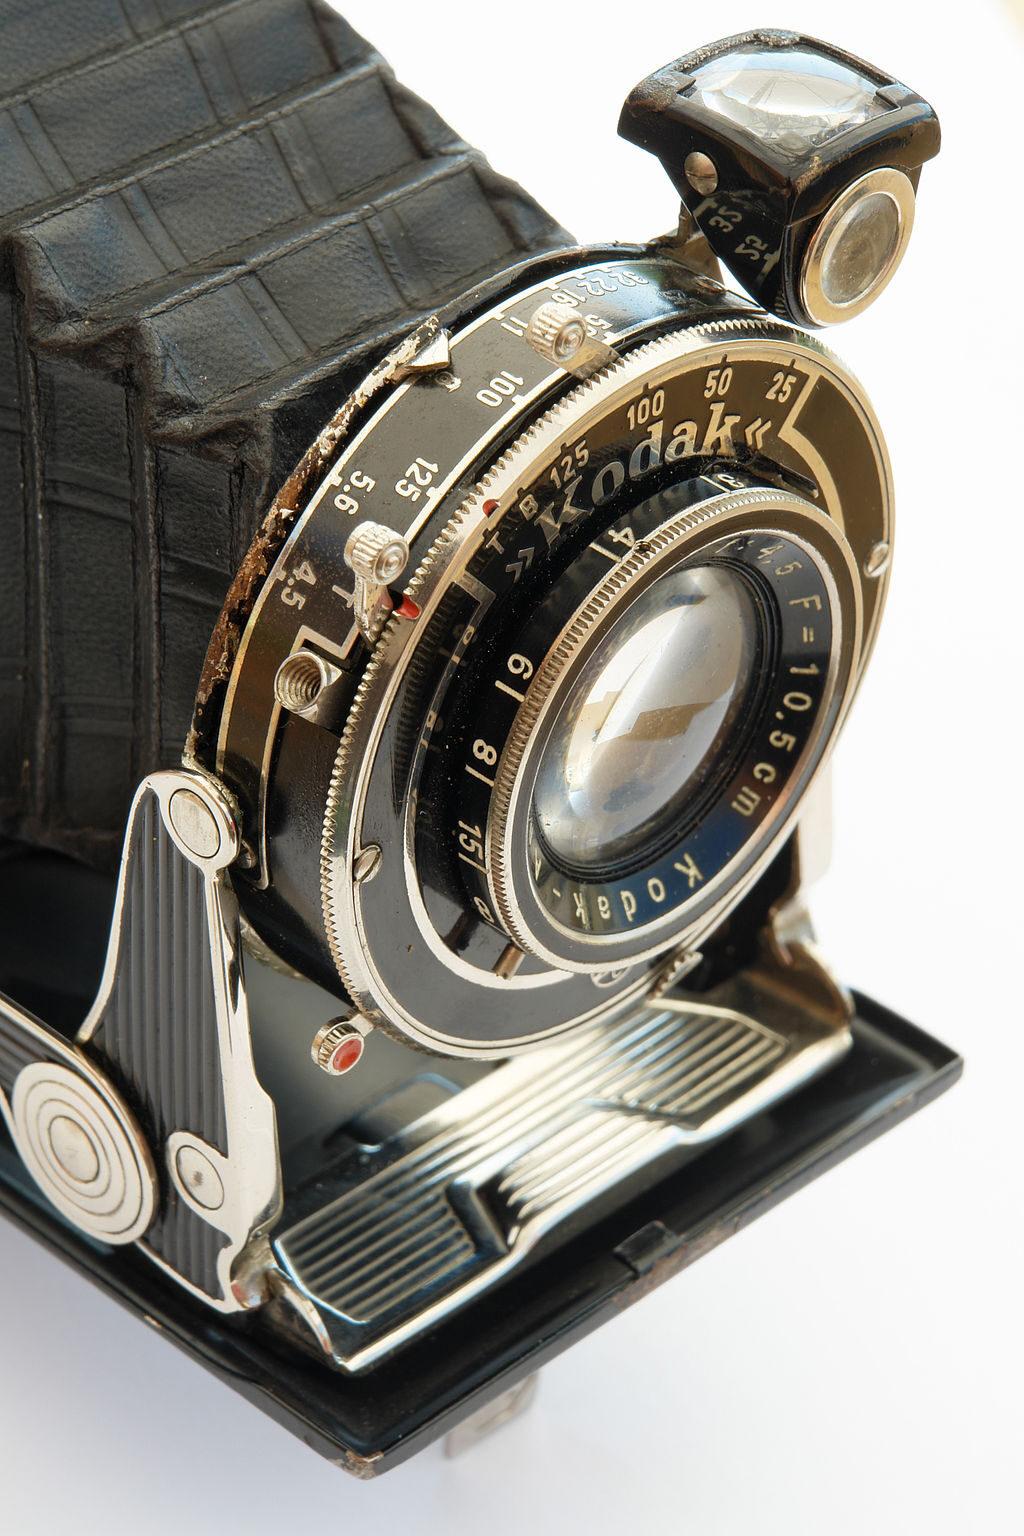 1024px-Kodak-Vollenda620-detail.jpg